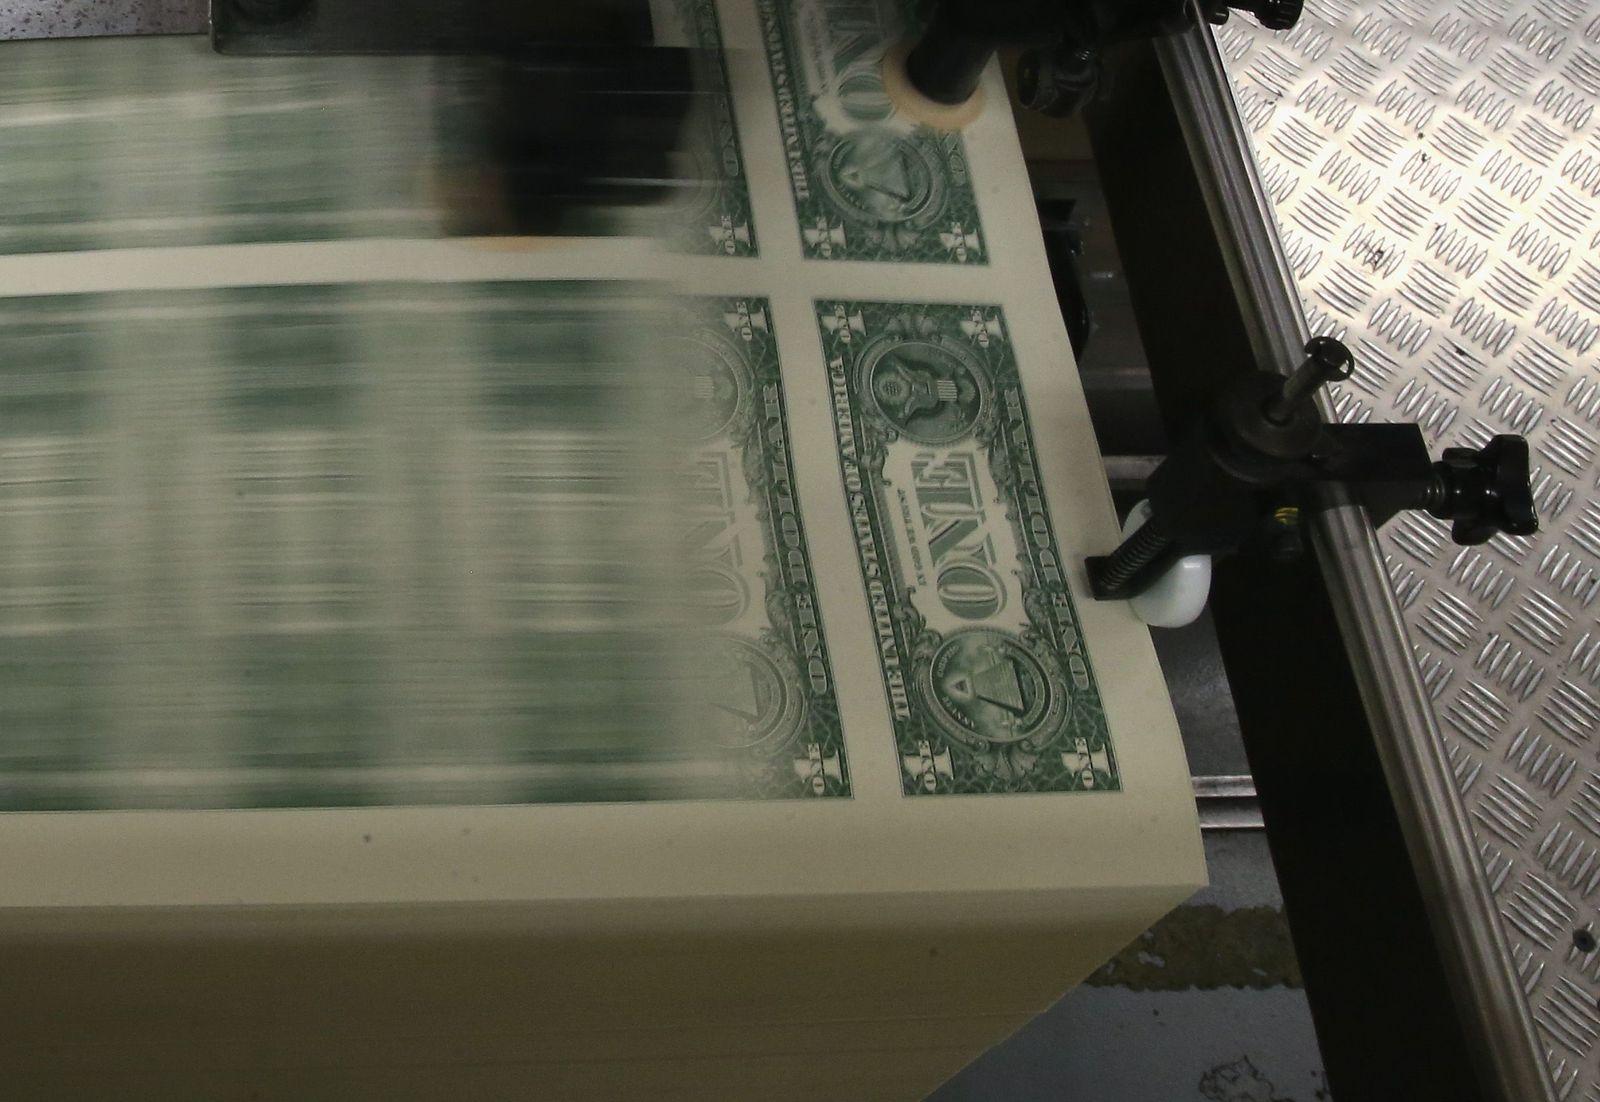 FILES-US-BANKING-LAW-REGULATION